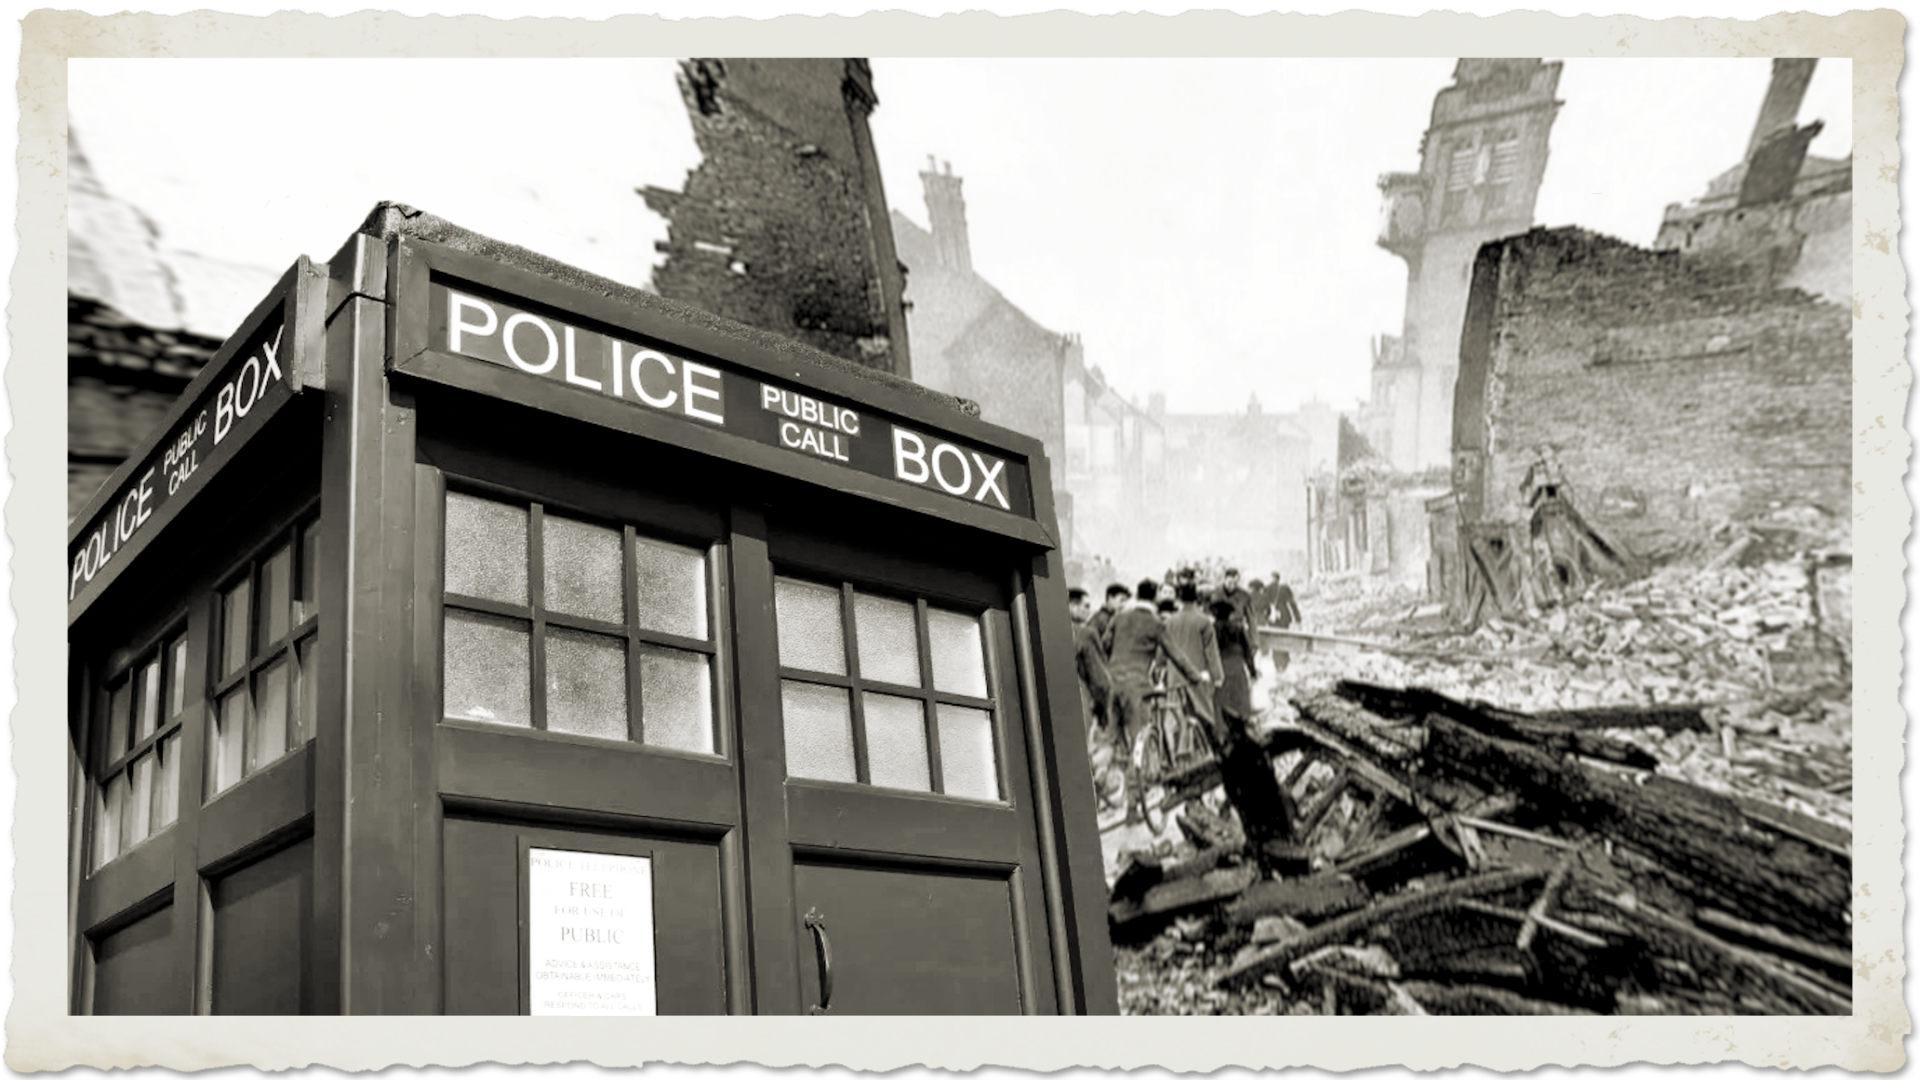 TARDIS in the London Blitz by Tarlan